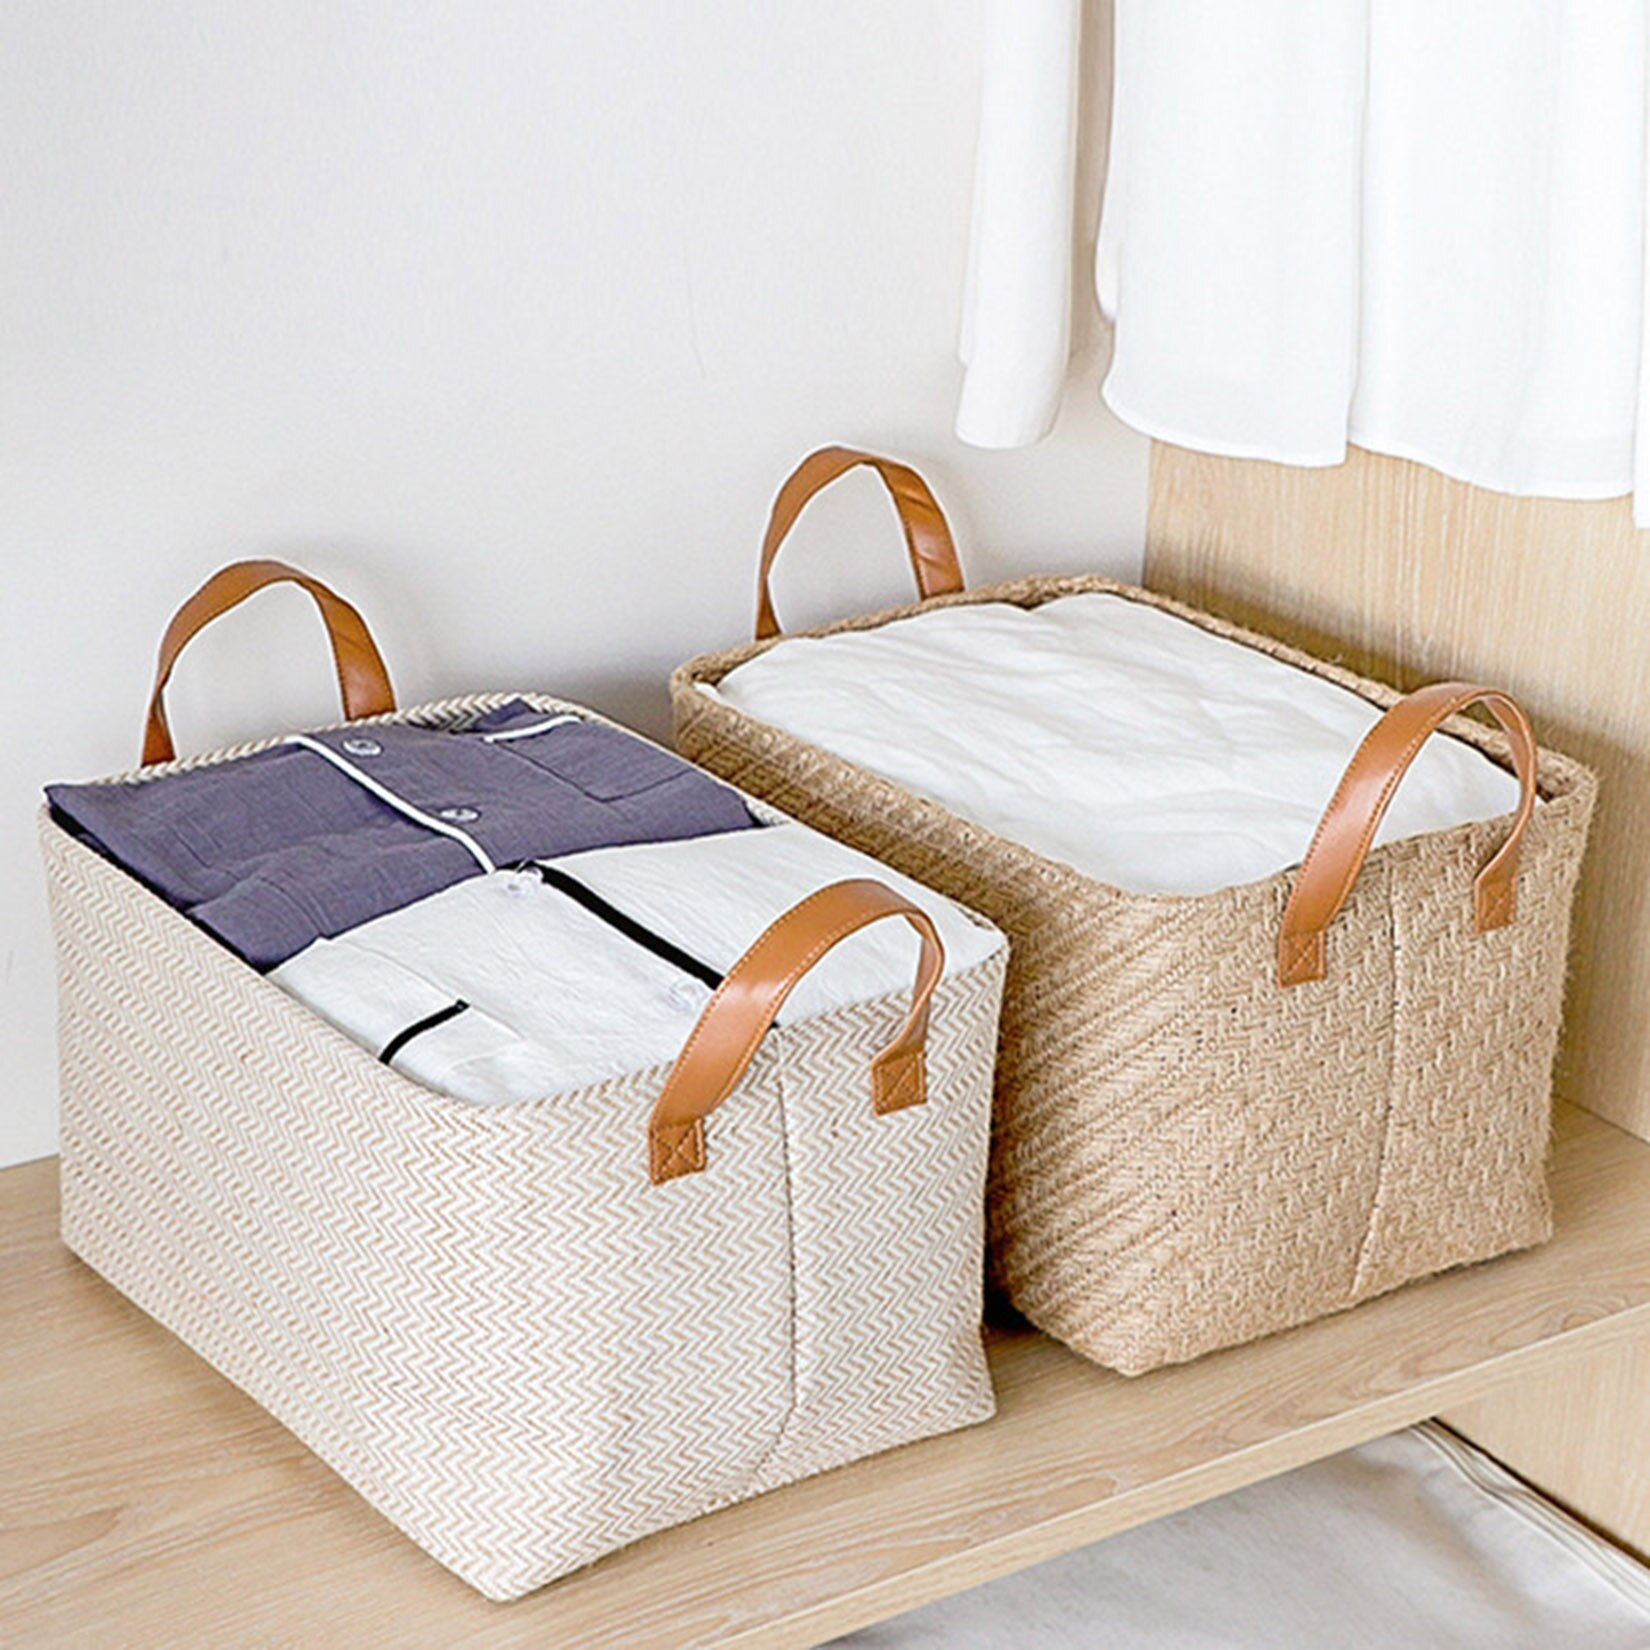 2pcs Woven Storage Baskets Foldable Storage Box with Handle Book Sundries Clothes Oragnizer Closet Organizer Large Woven Basket